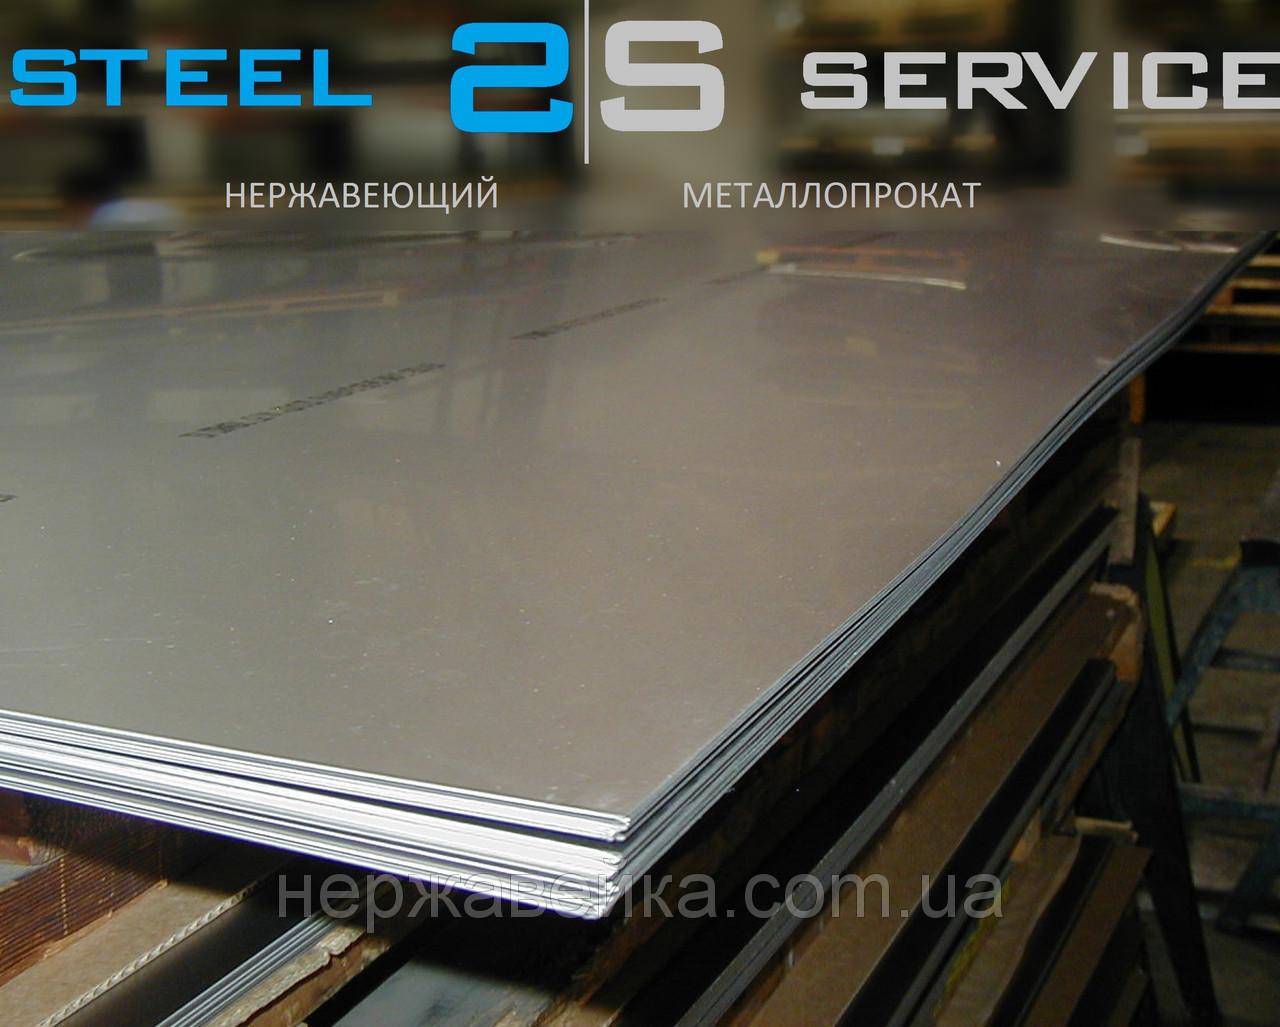 Нержавейка лист 0,4х1250х2500мм AISI 321(08Х18Н10Т) 2B - матовый, пищевой